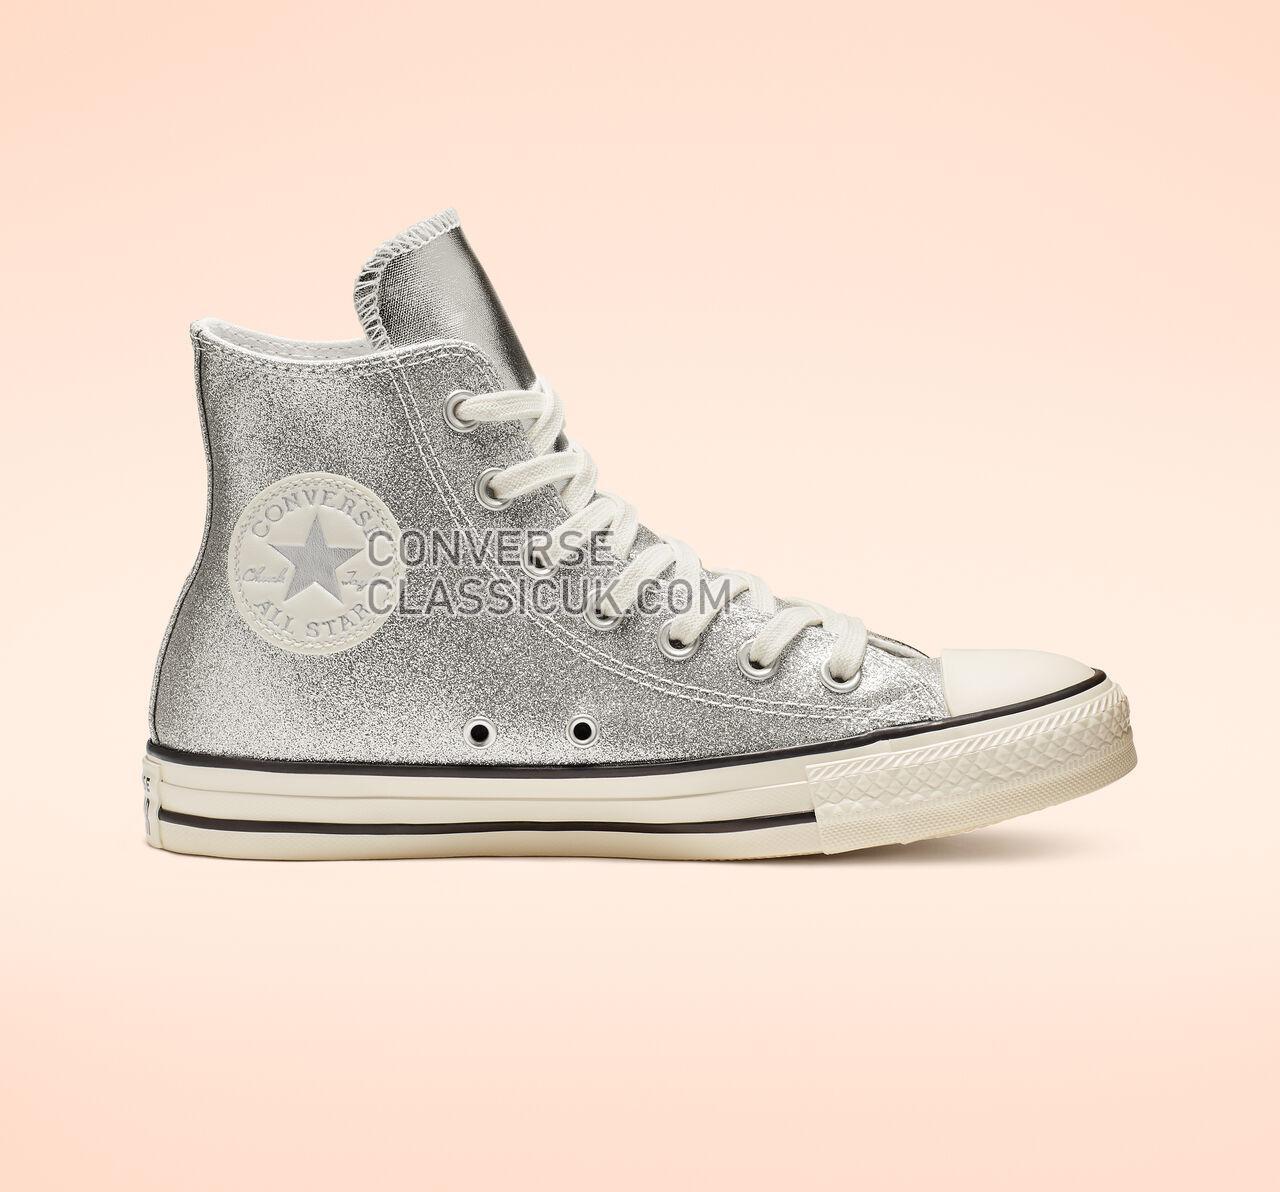 Converse Chuck Taylor All Star Shiny Metal High Top Womens 564869C Silver/Egret/Black Shoes